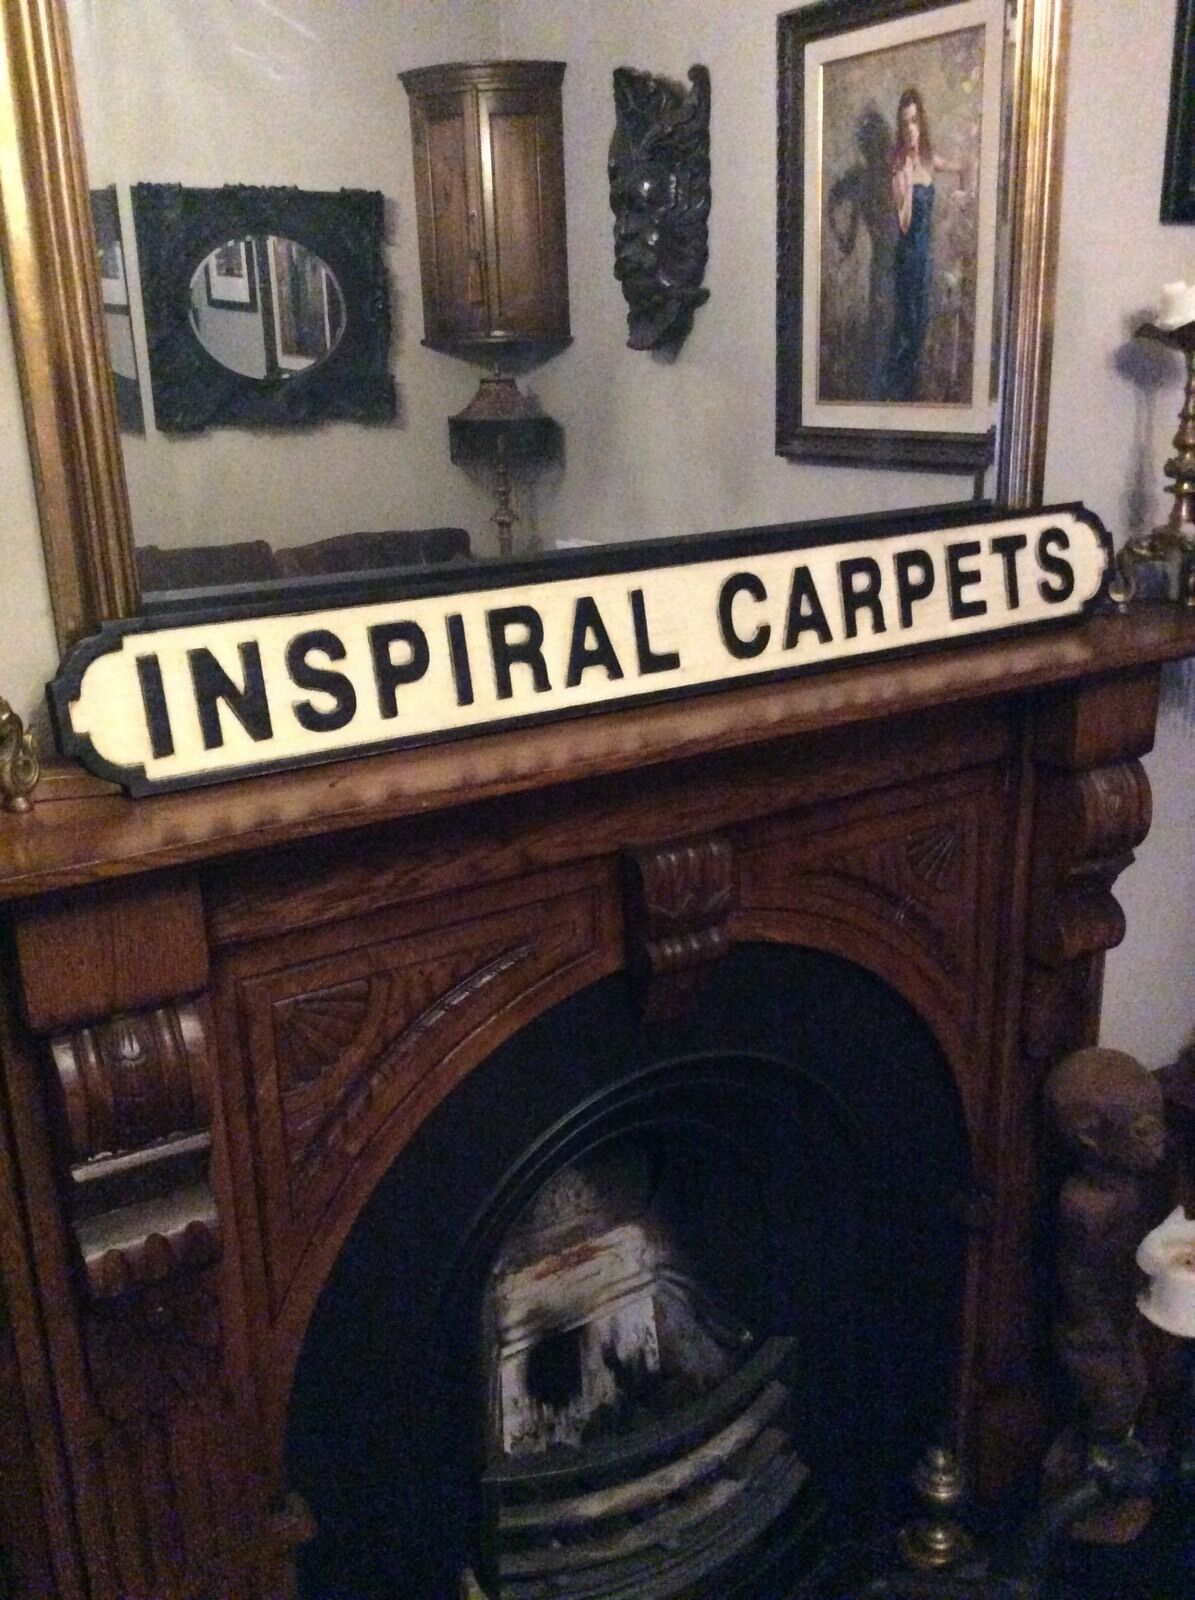 Inspiral Carpets Manchester Indie Noel Gallagher in Legno Scolpito Segno